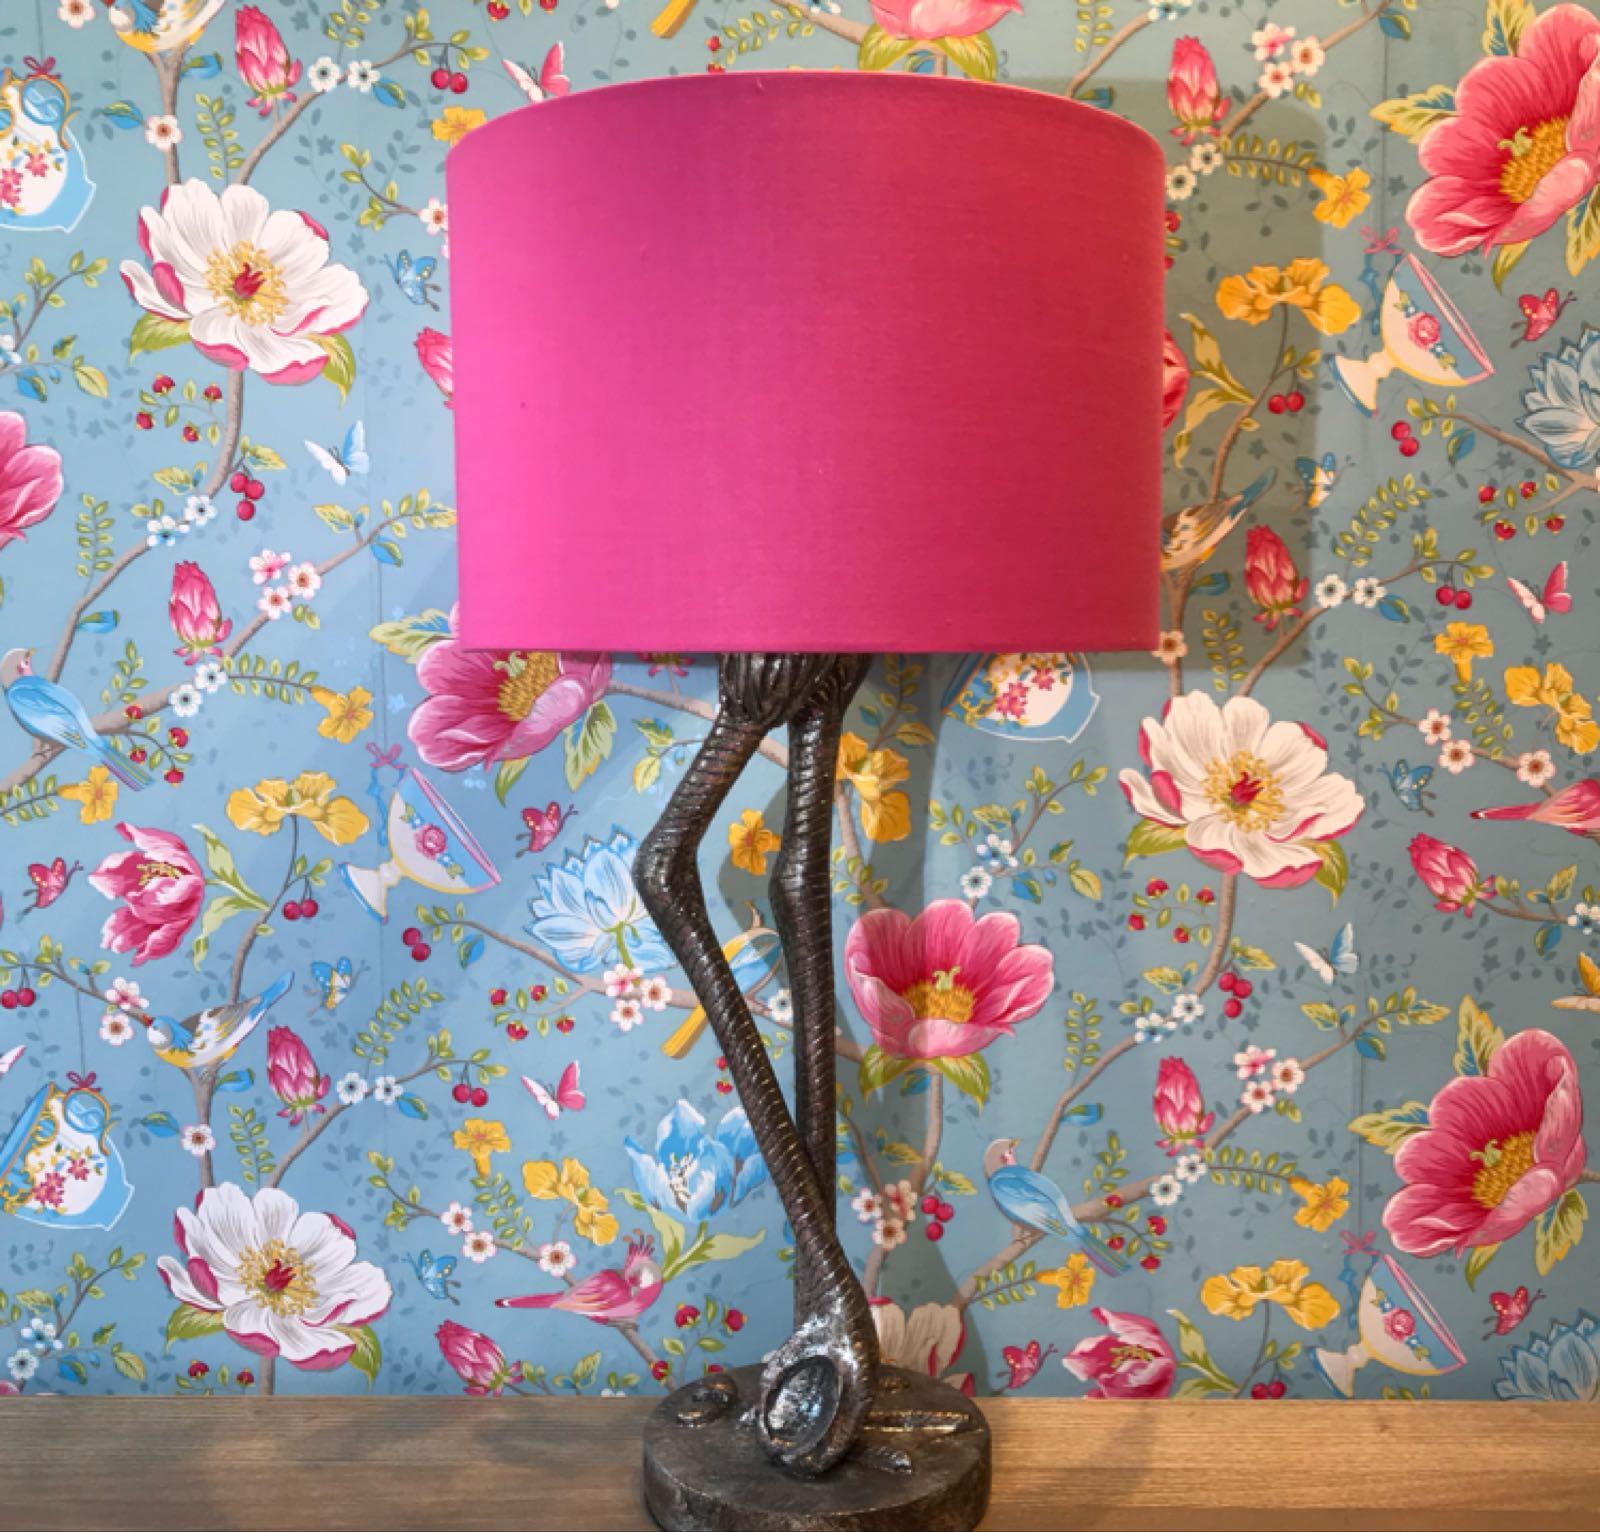 Pink flamingo lamp small 60 x 30 cm